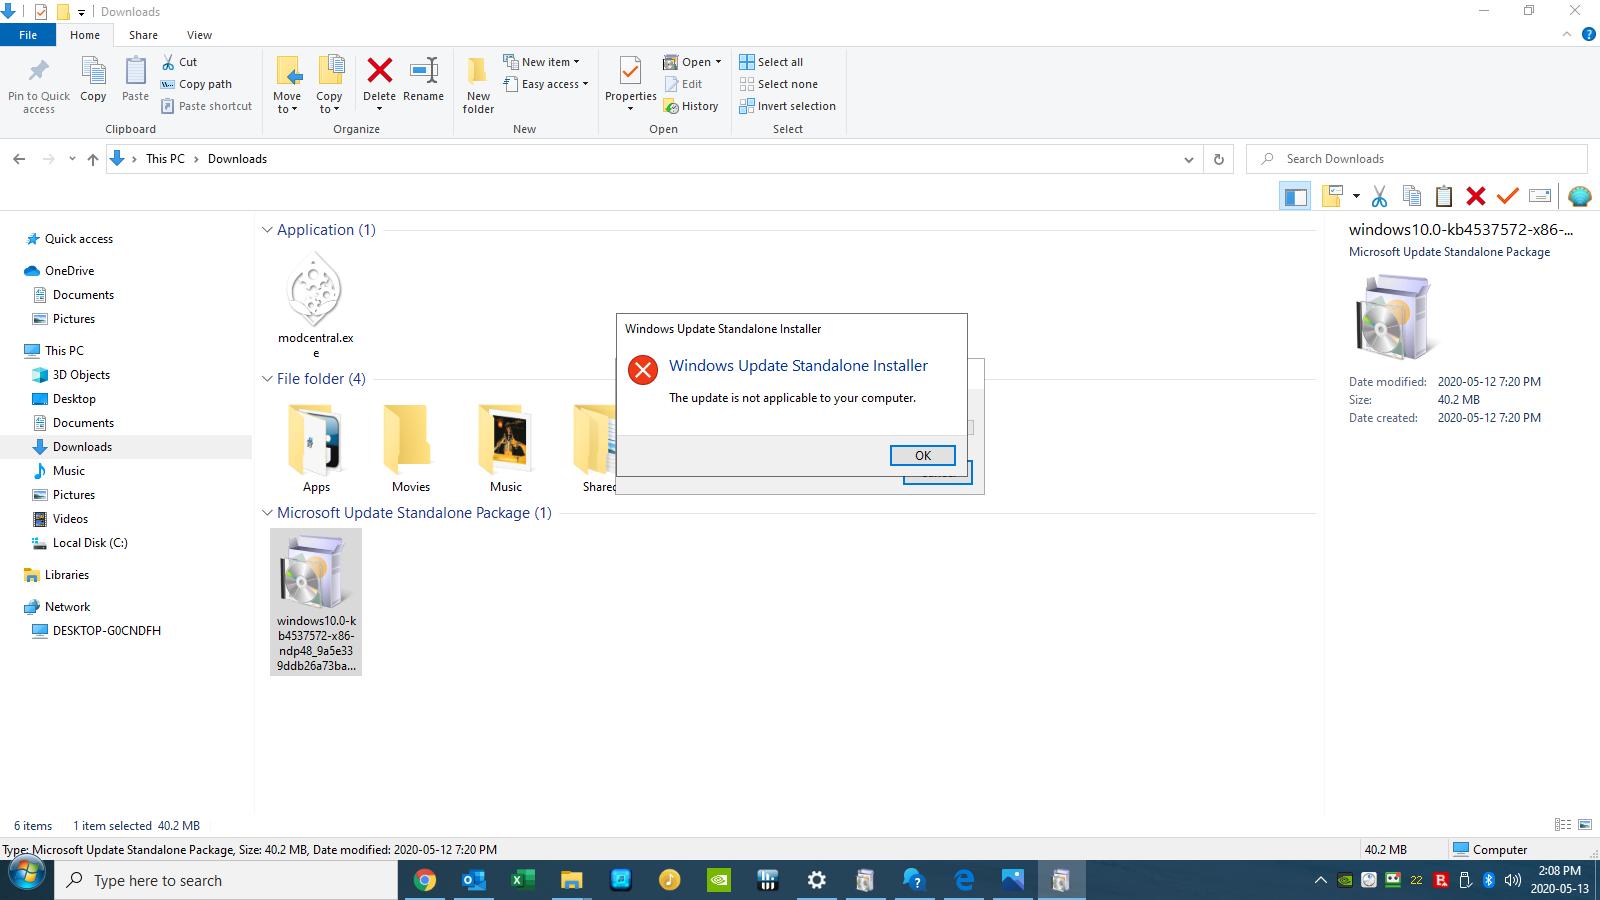 Windows 10 Pro 64 bit 1909, having problem installing net. framework? v0ktiJ.png